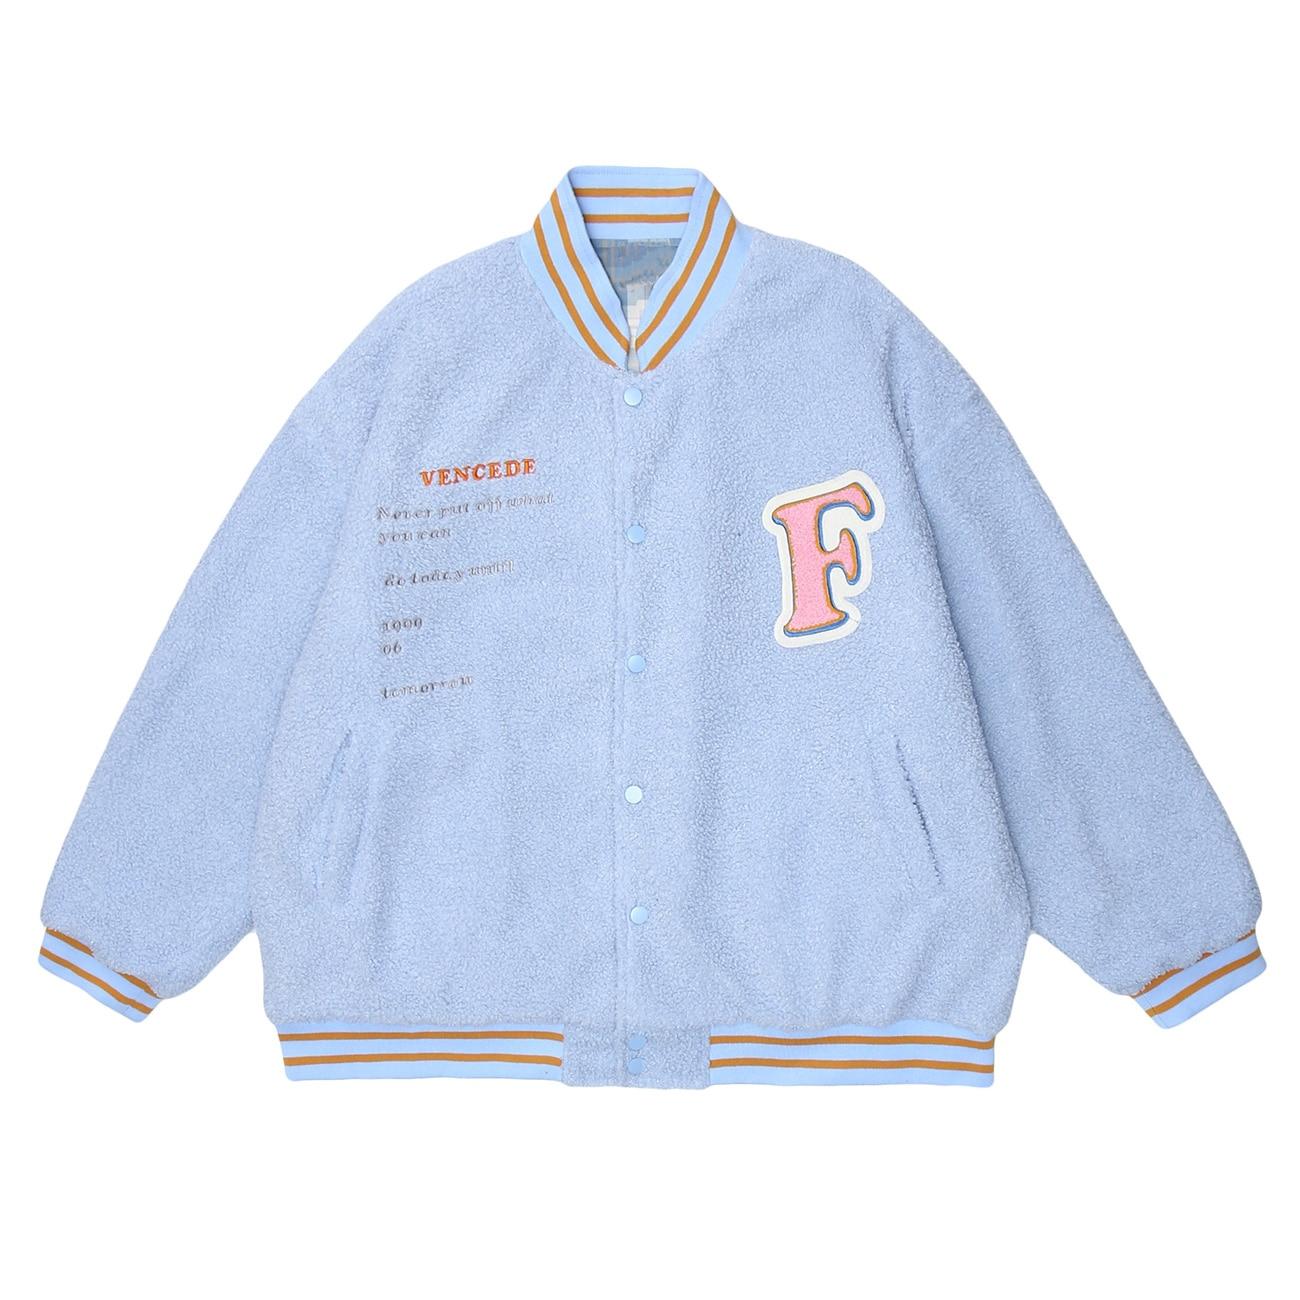 2020FW Hip Hop Baseball Jacket Reversible Bomber Jackets Mens Harajuku Streetwear Patchwork Lambswool Graffiti Unisex Outwear